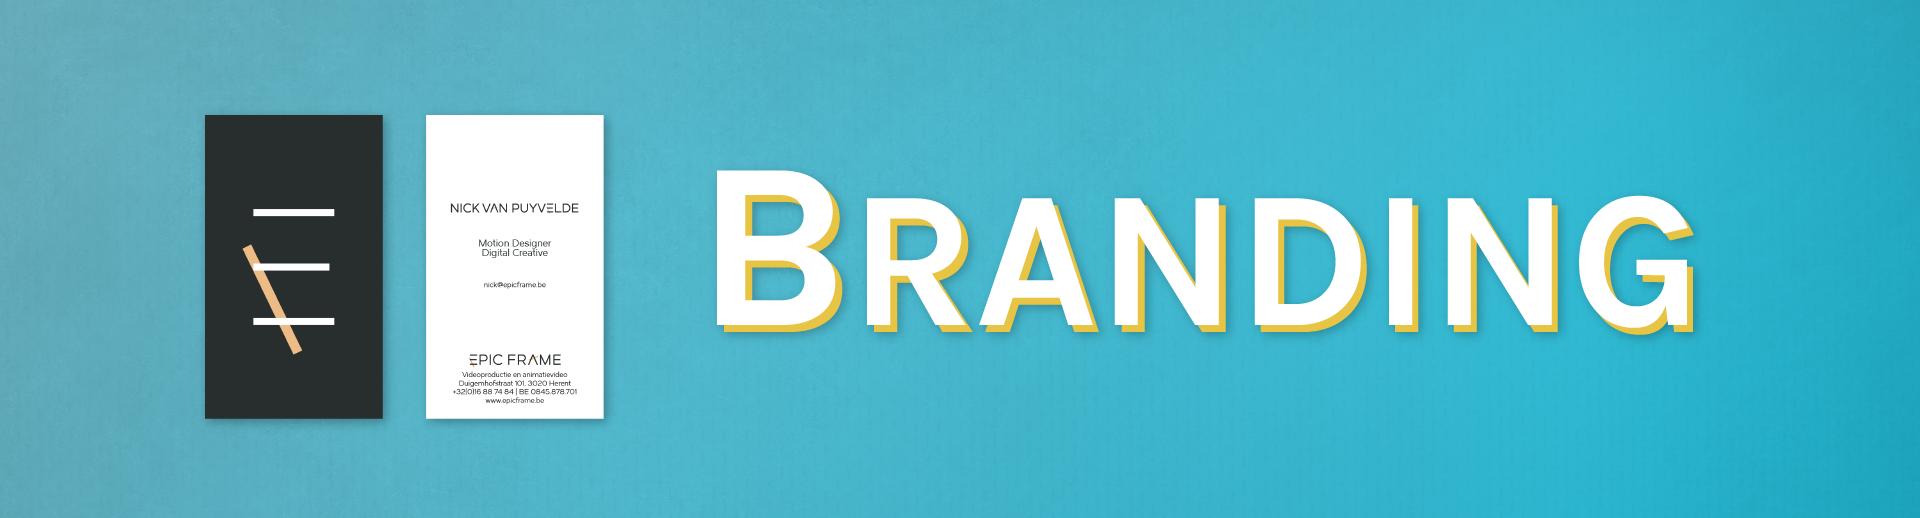 Branding_thumbnail